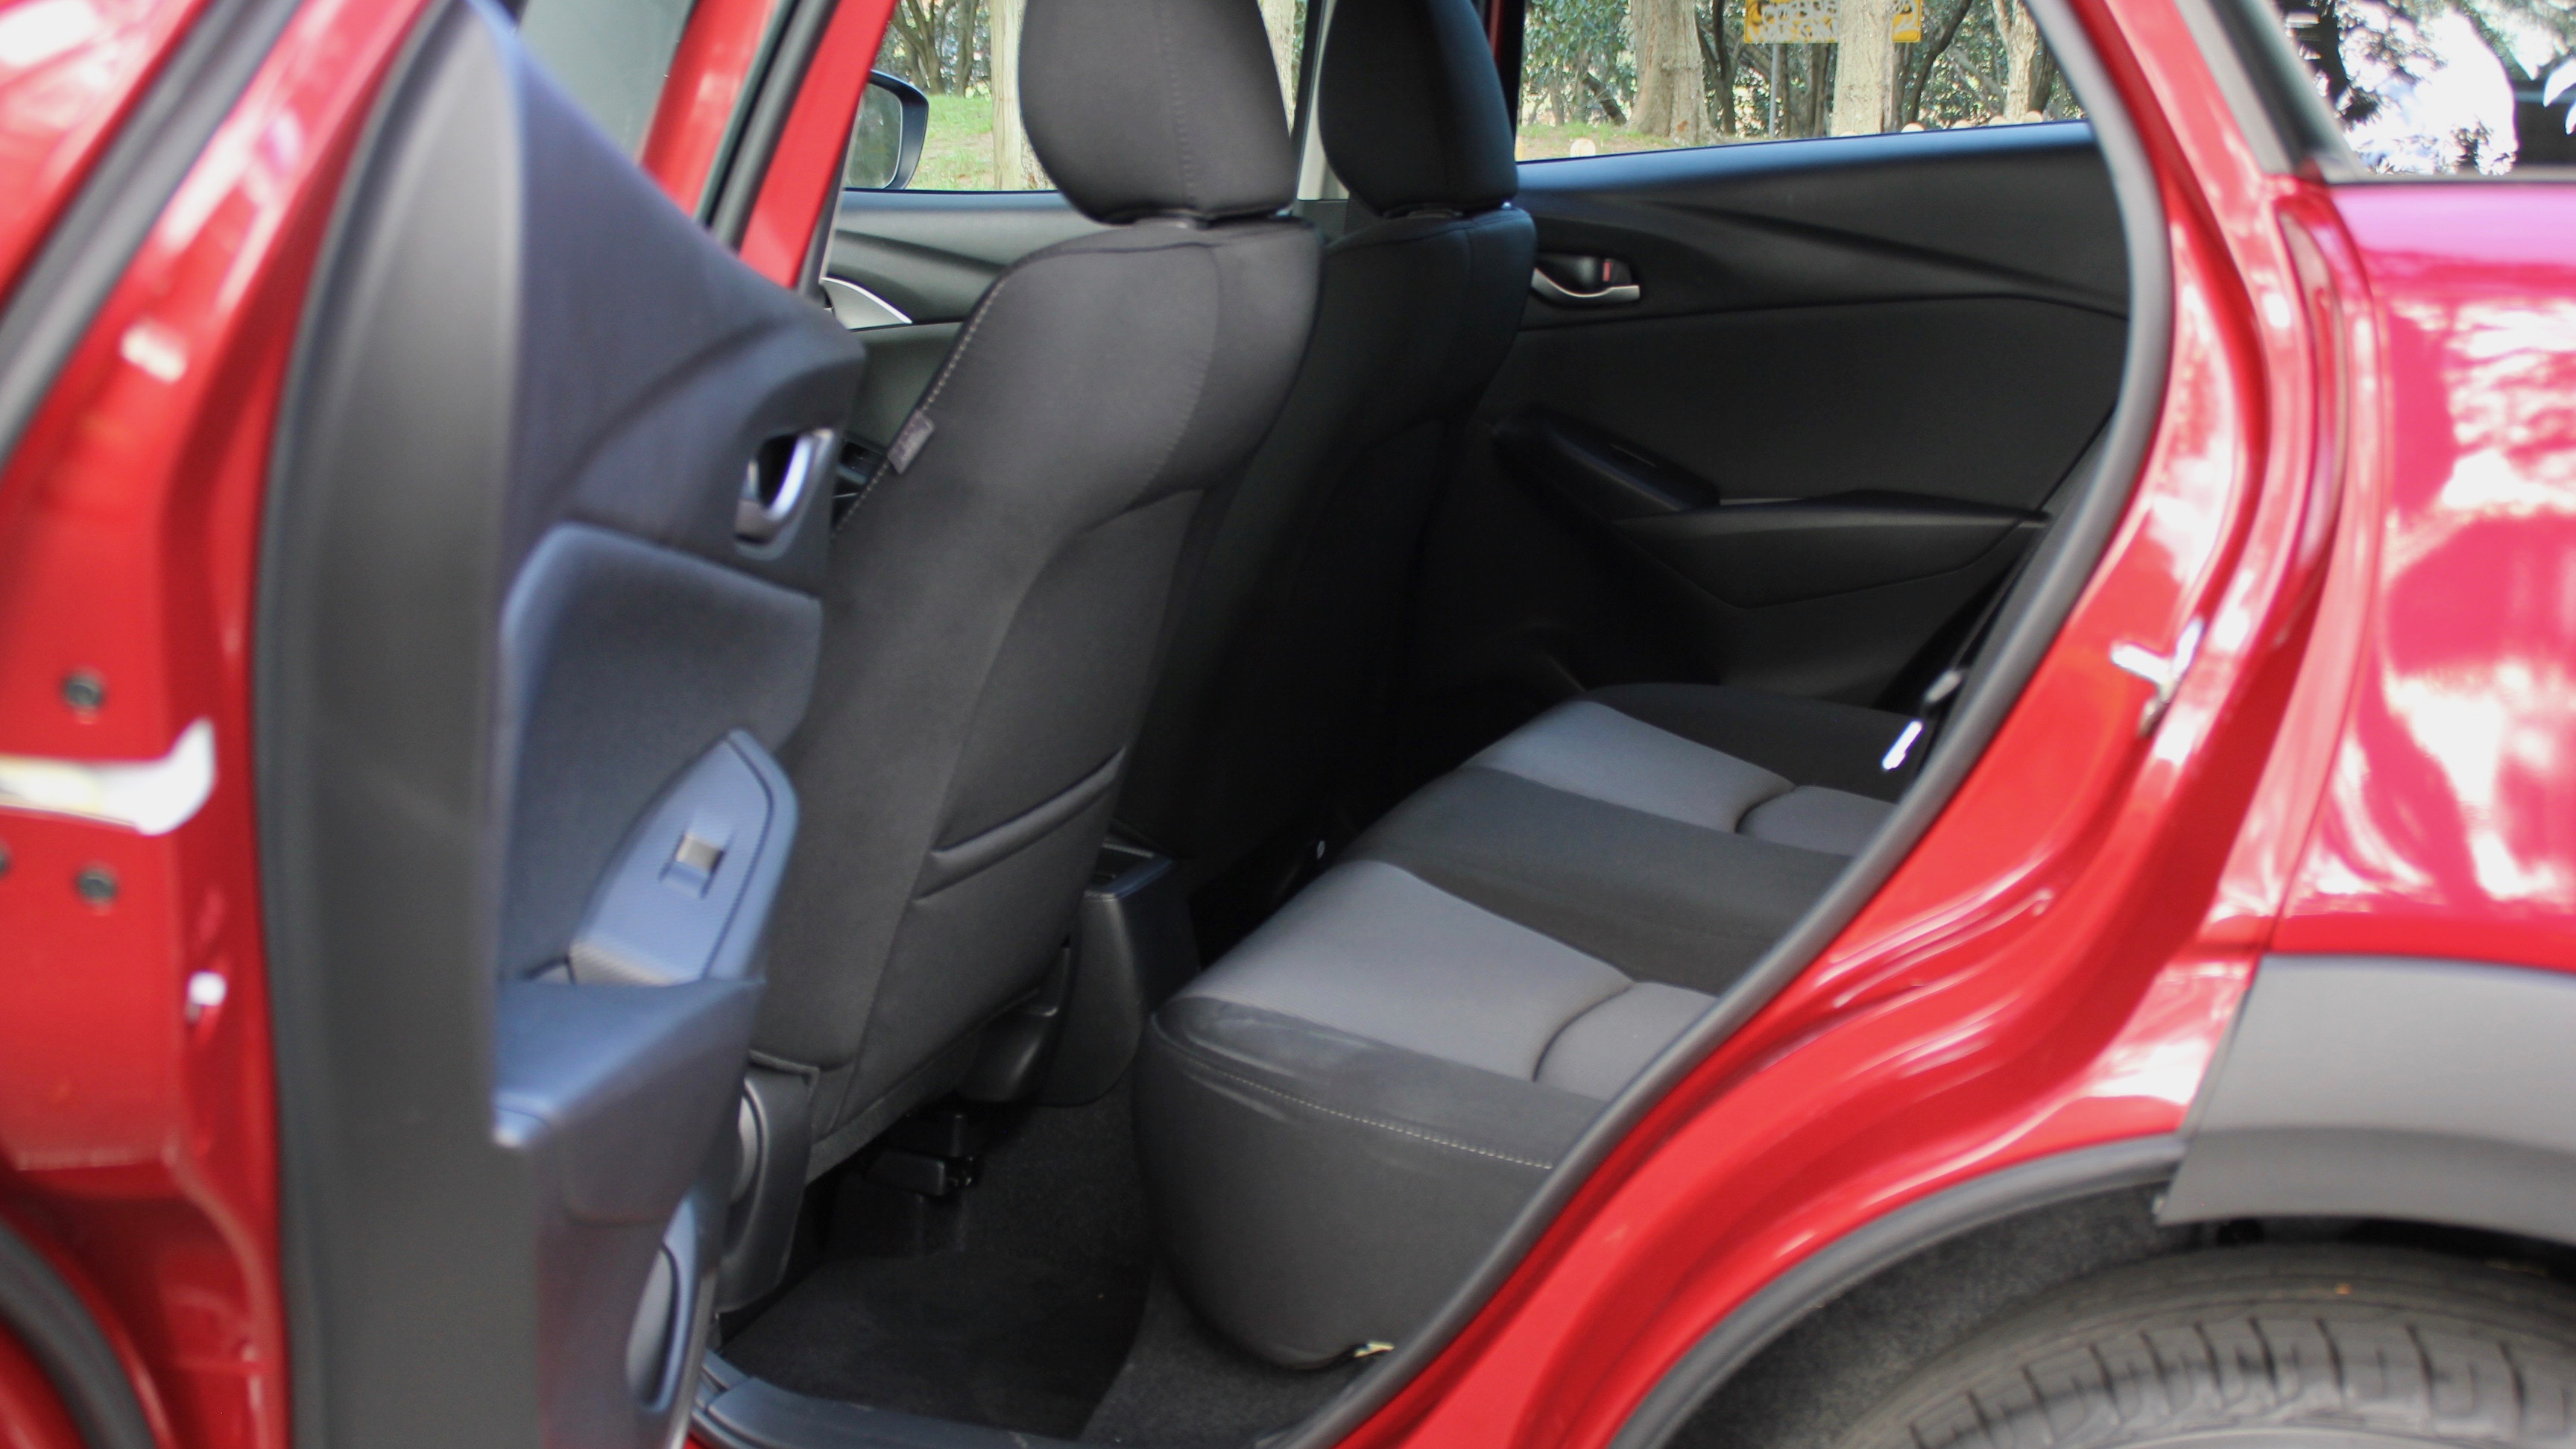 2018 Mazda CX-3 rear seat